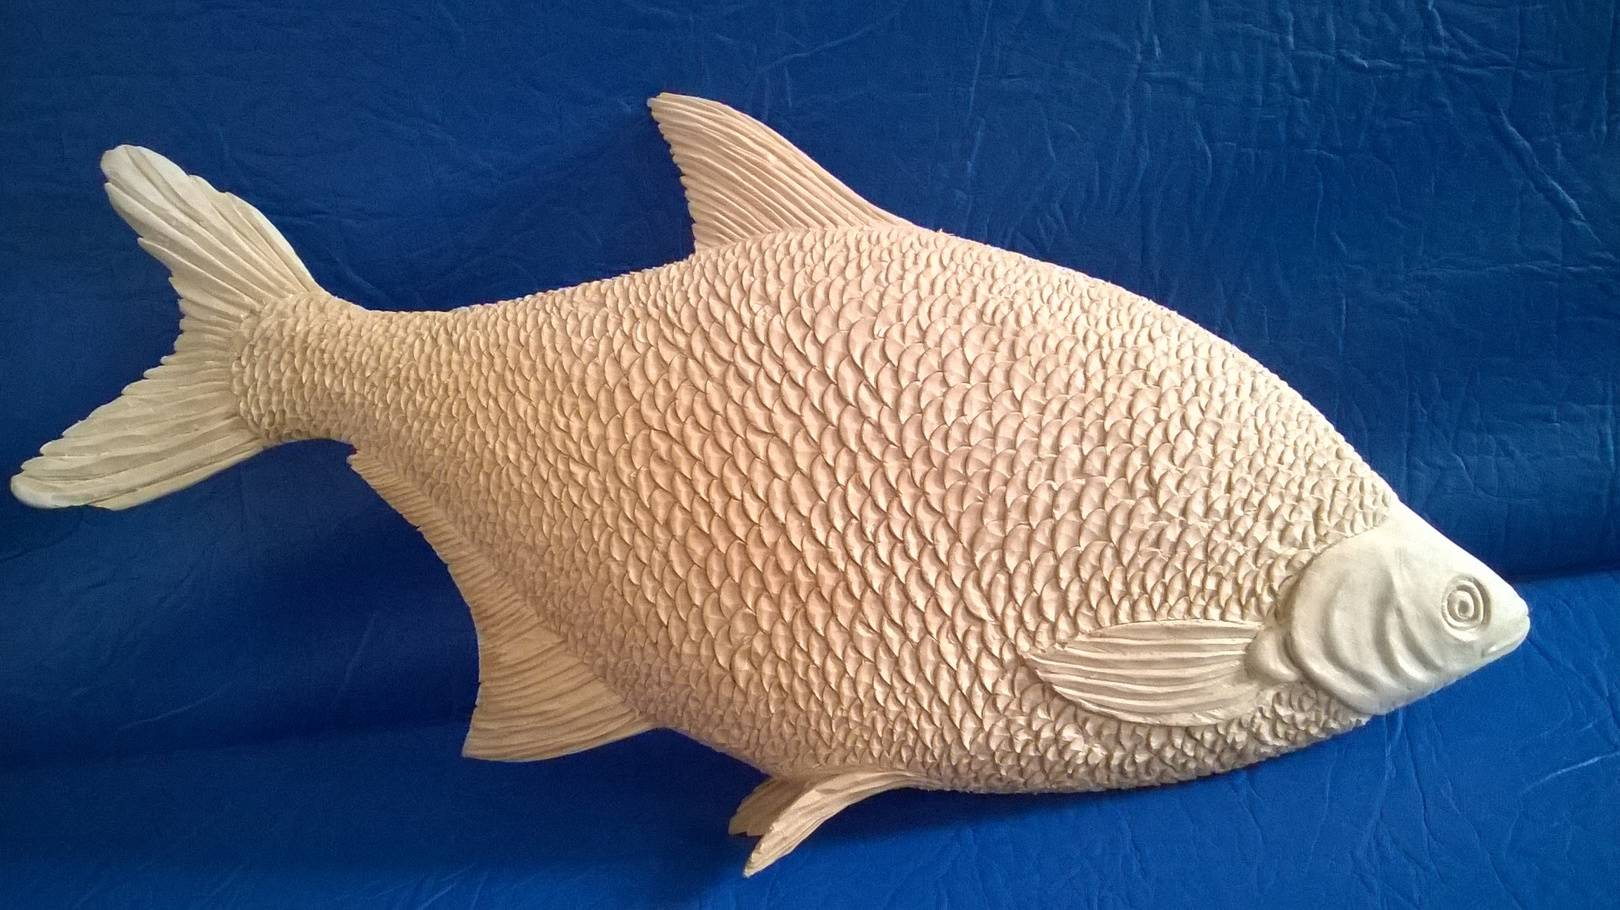 рыба-лещ из дерева